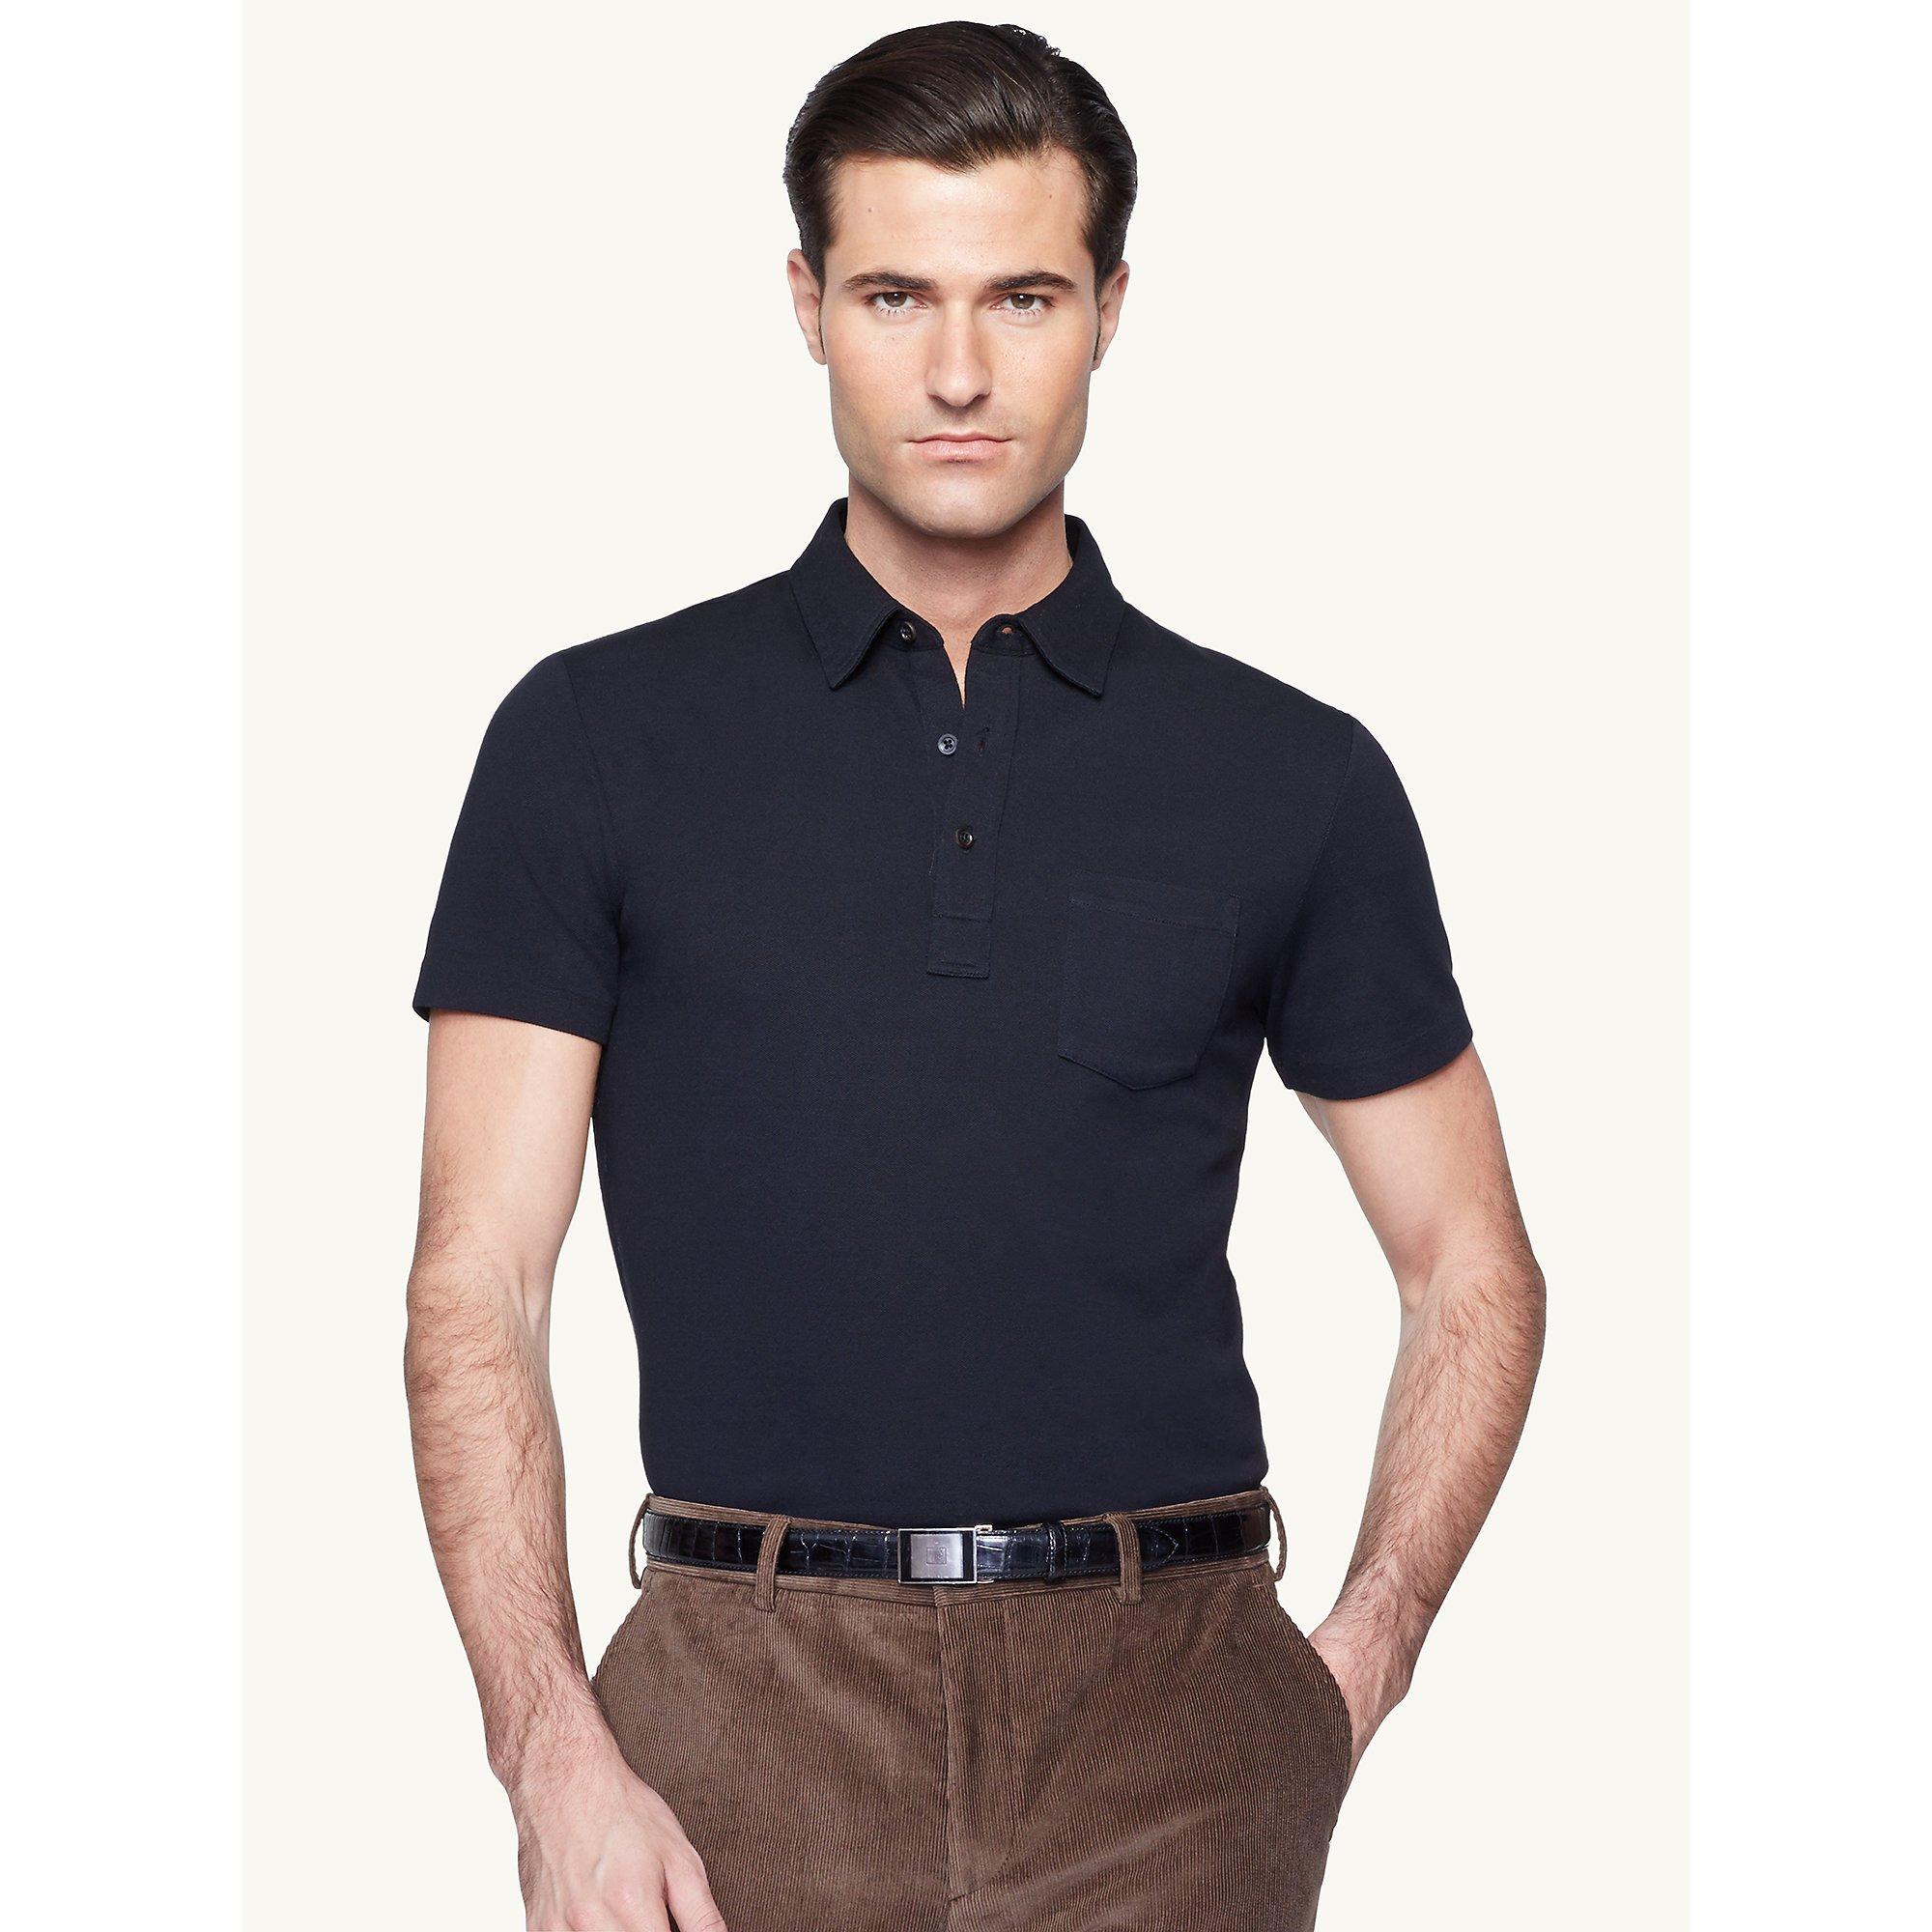 Ralph lauren black label short sleeved pocket t shirt in for Short sleeve polo shirt with pocket